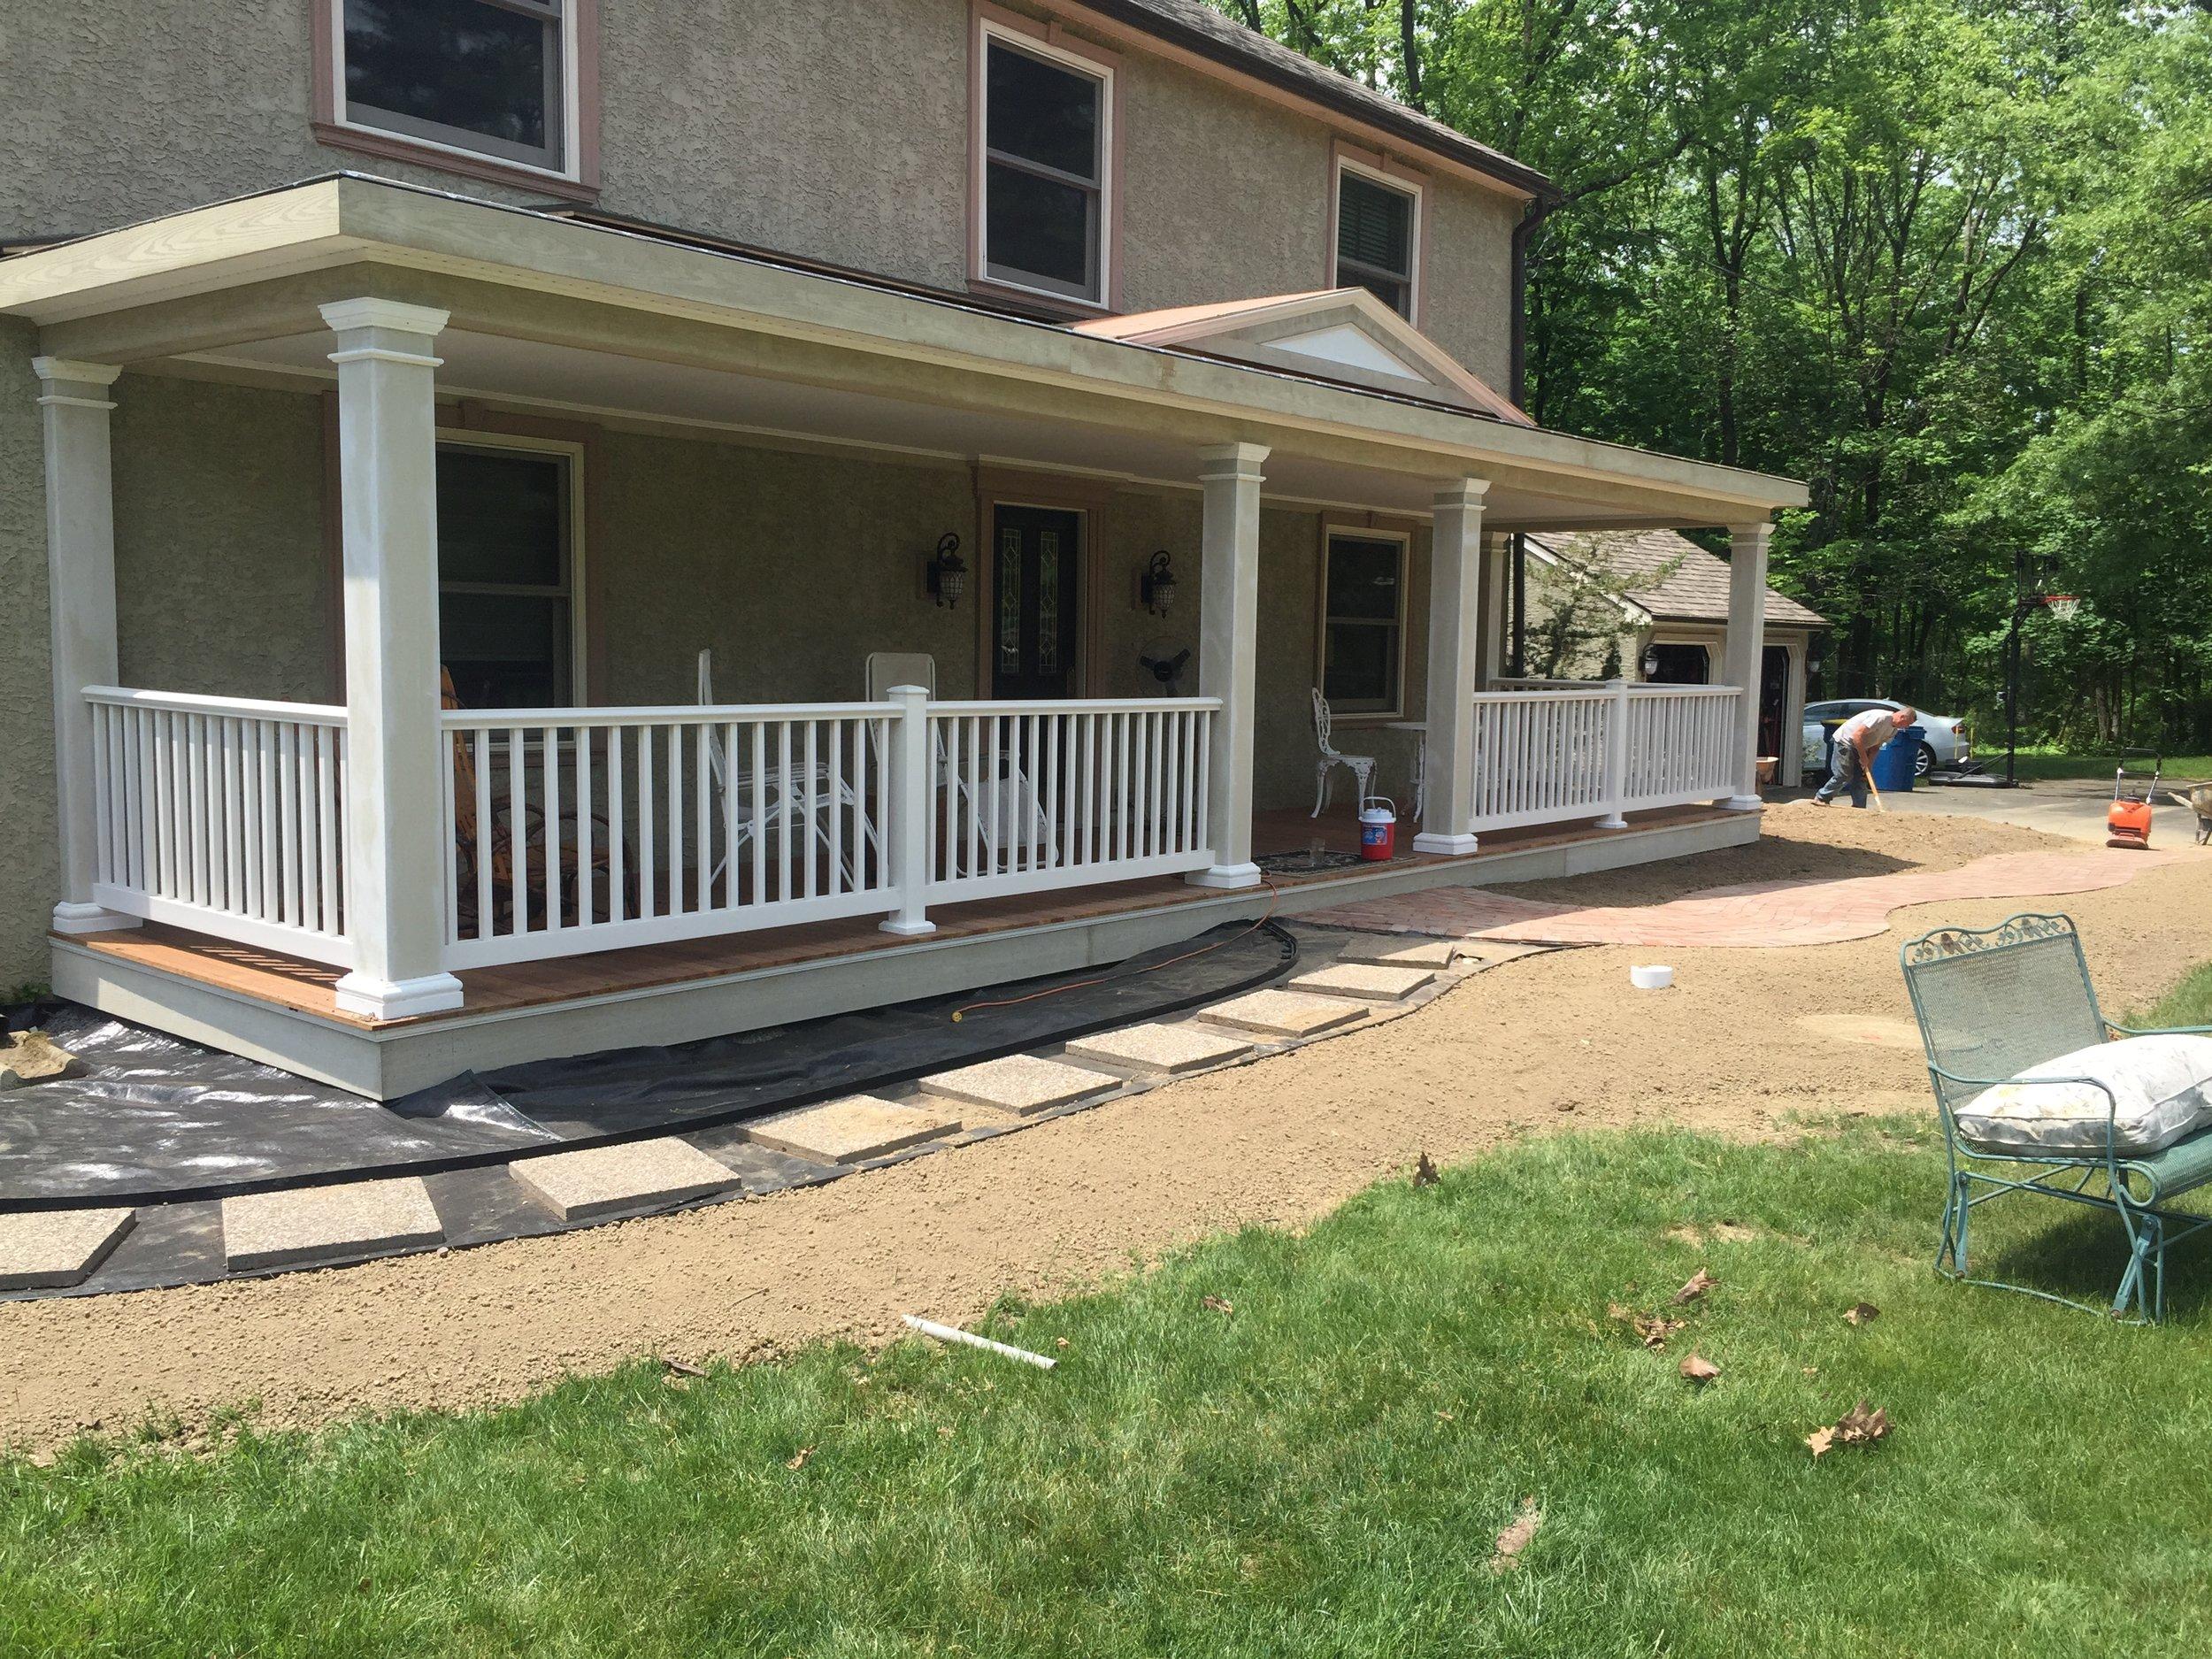 terri feralio - front porch landscaping (2).JPG